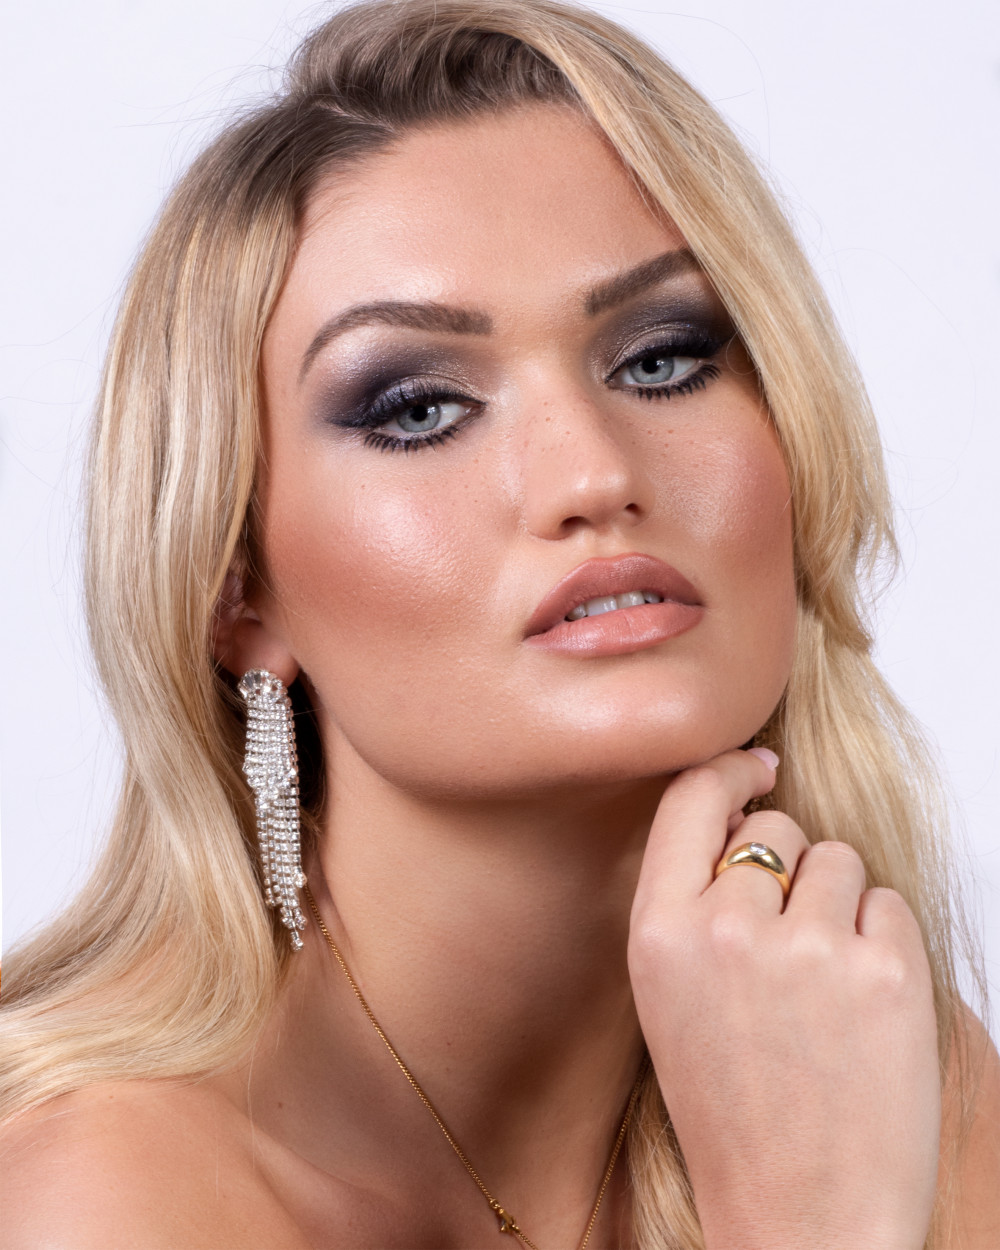 Makeup by me Hair by Cimone  Www.cimonecheveux.co.uk - Make Me Bridal Artist: Rosie Cerosio Makeup. Photography by: Jasmine Boulton. #glamorous #bridalmakeup #smokeyeyes